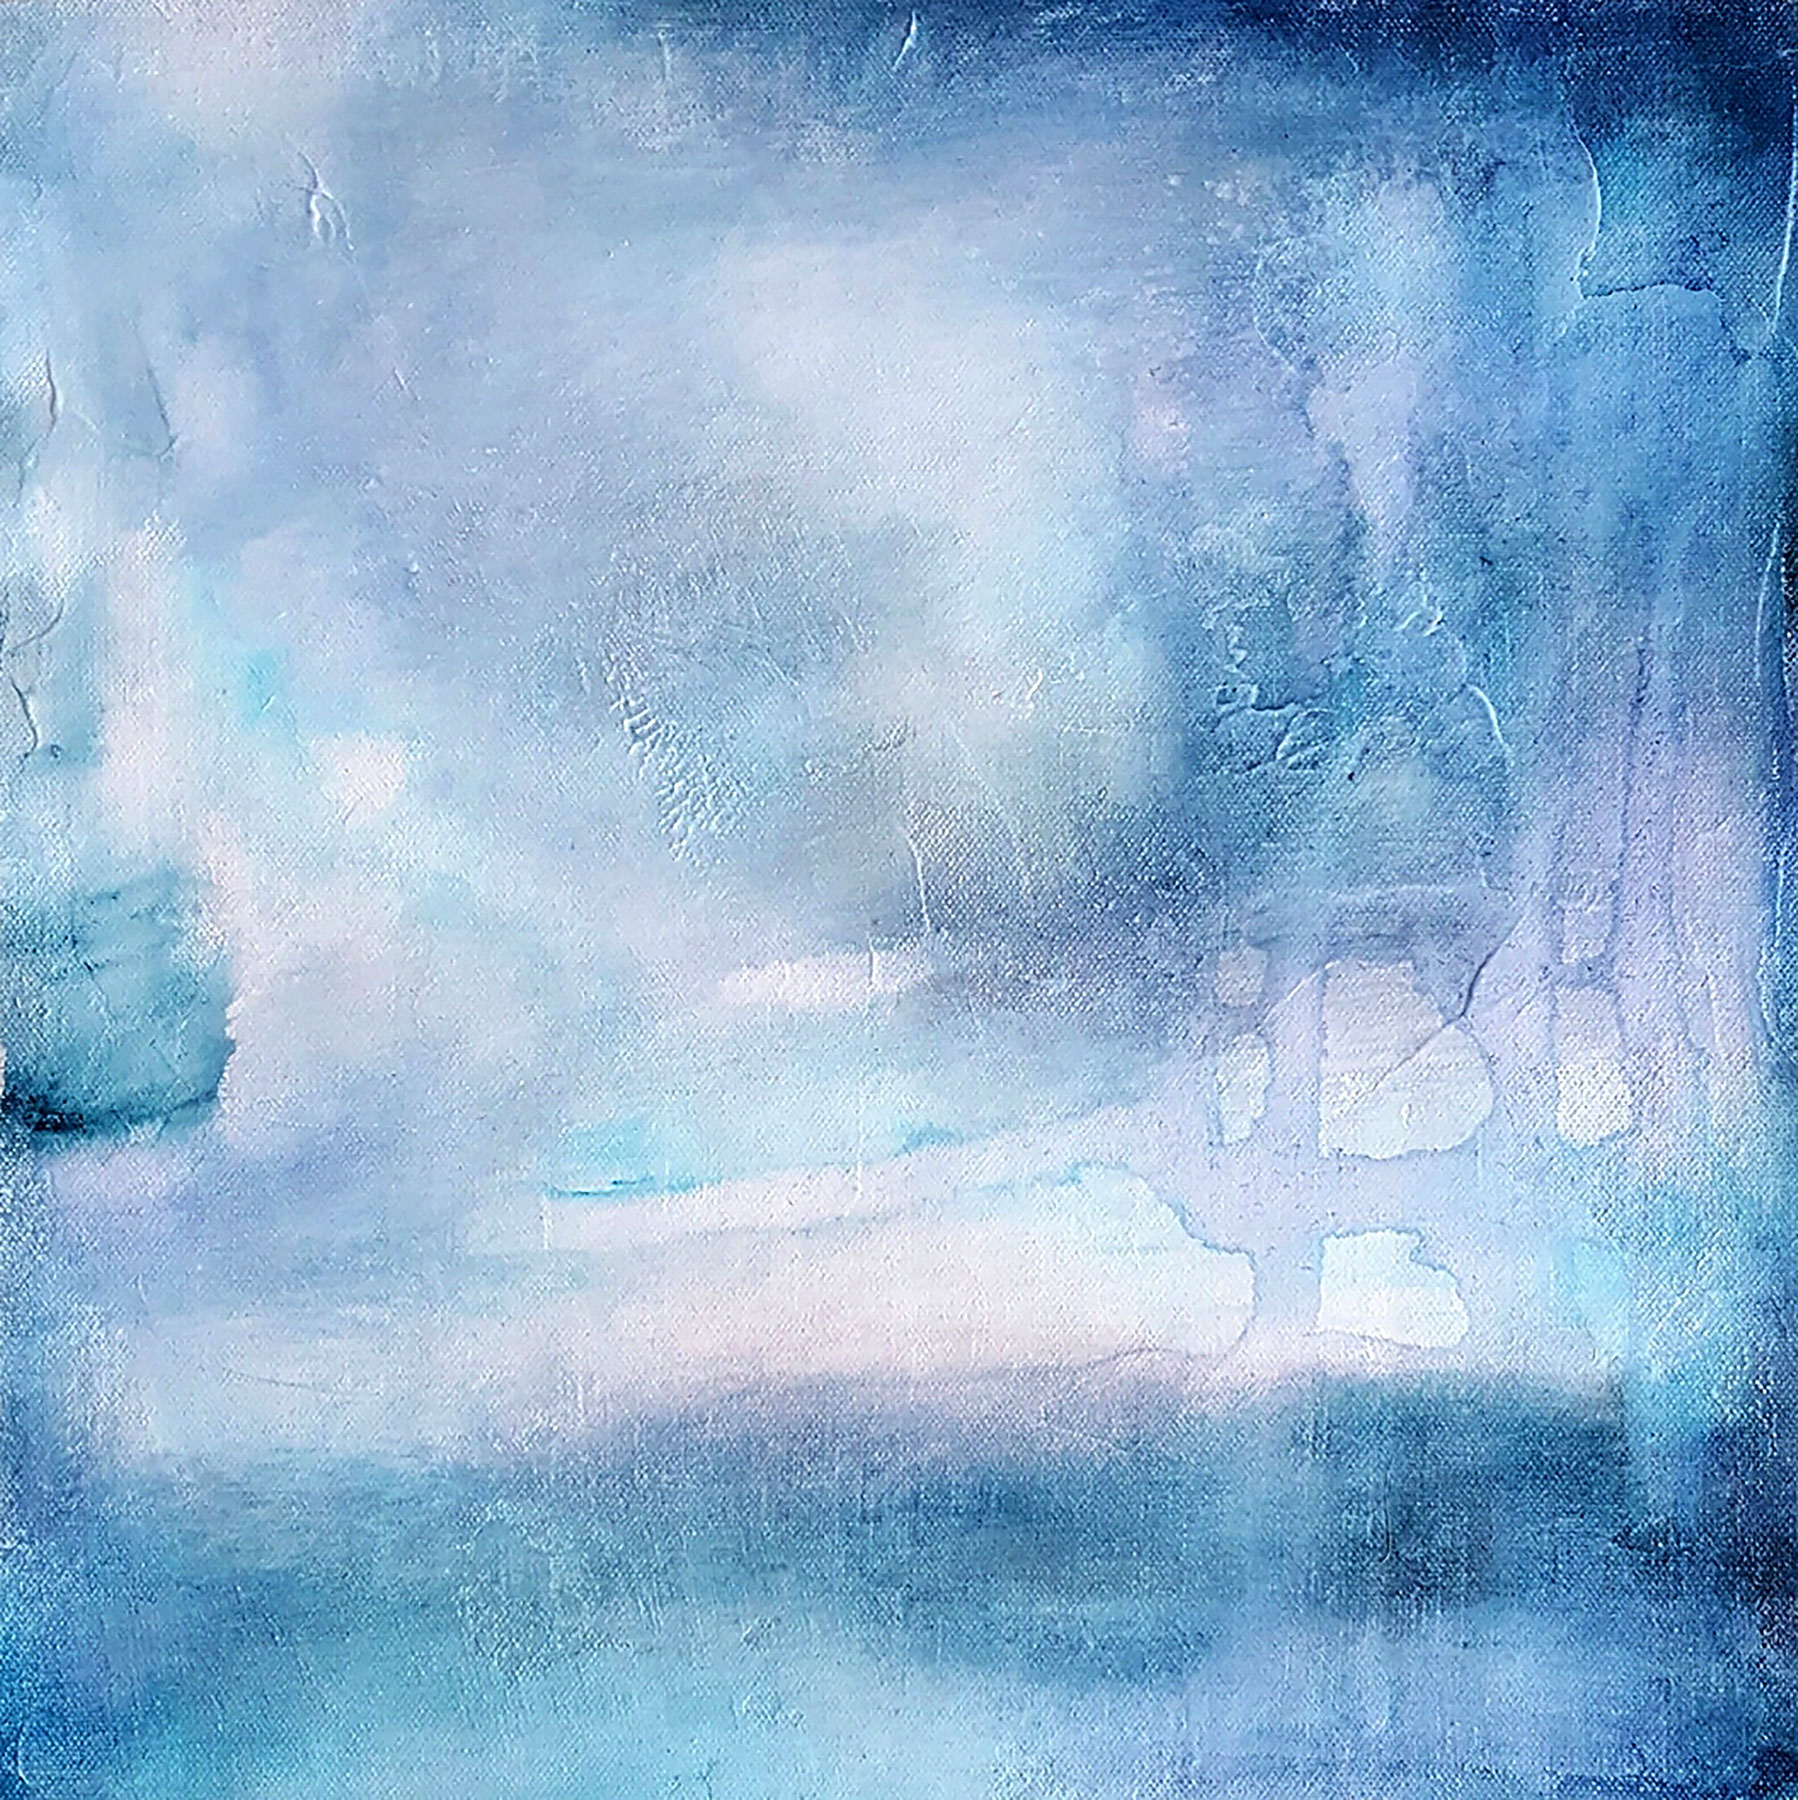 Blue-Mist-cropped.jpg